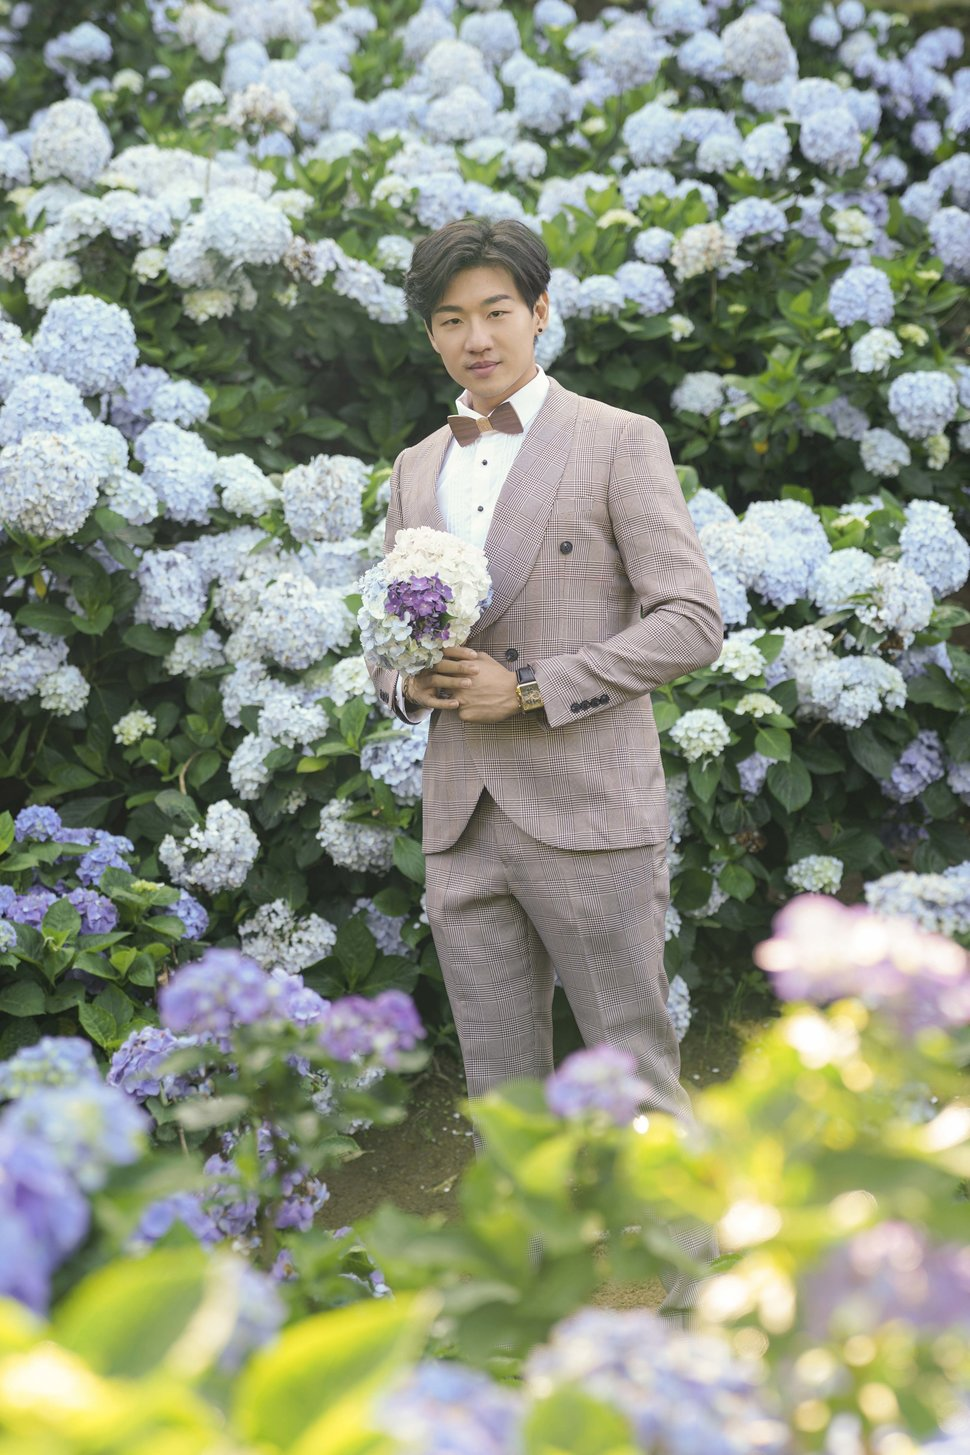 GM_06690 - GM俊彥 uxrw art studio - 結婚吧